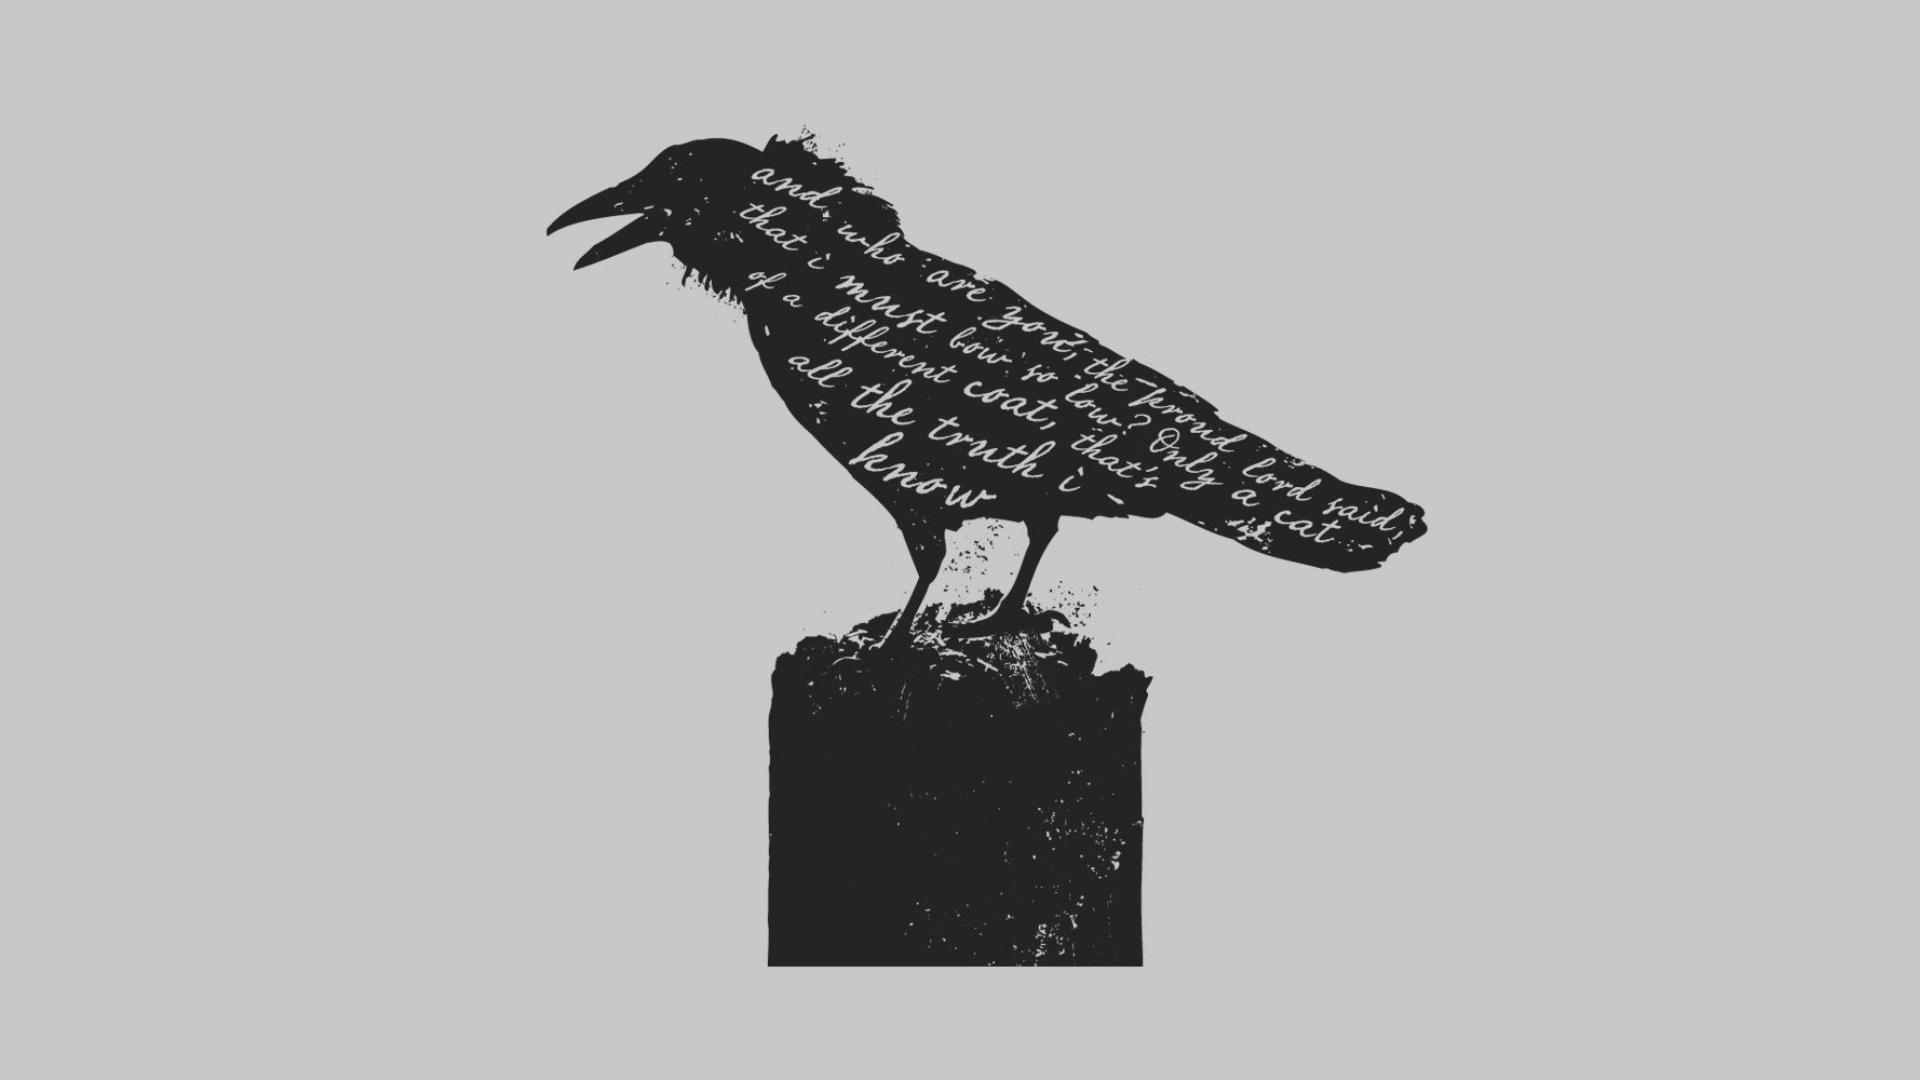 Drawing Illustration Monochrome Cartoon Raven Pattern Sculpture Nevermore ART Design 1920x1080 Px